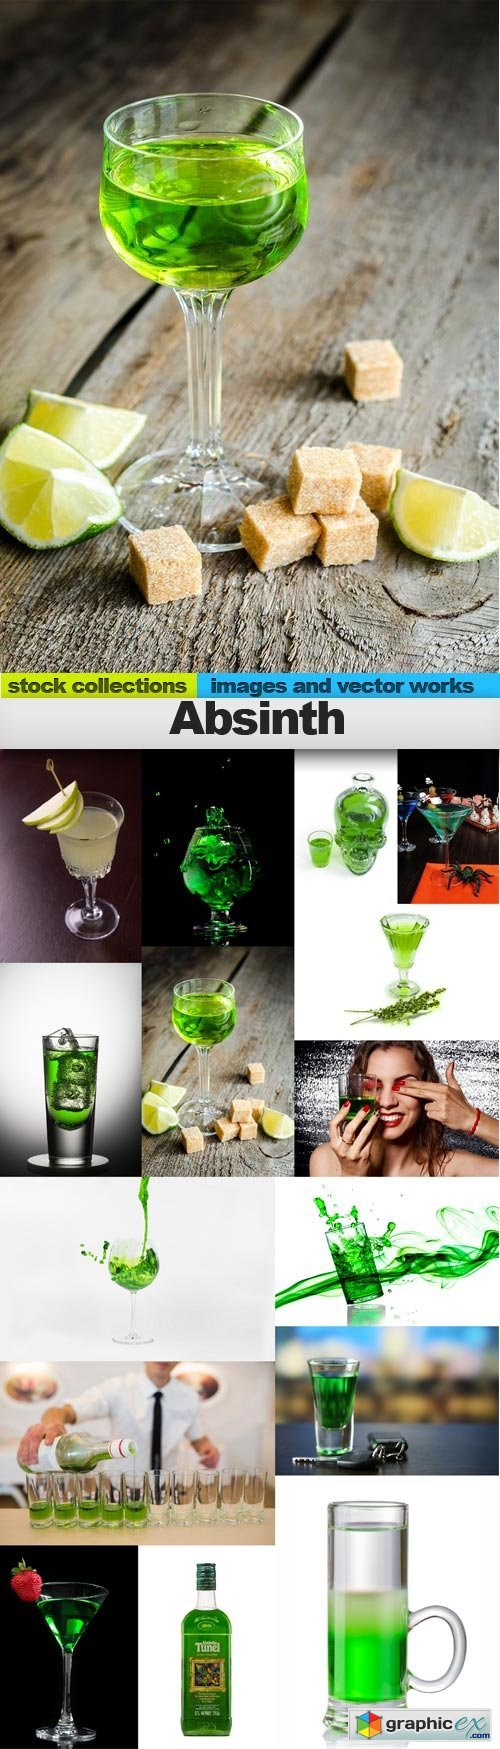 Absinth 15 x UHQ JPEG  stock images